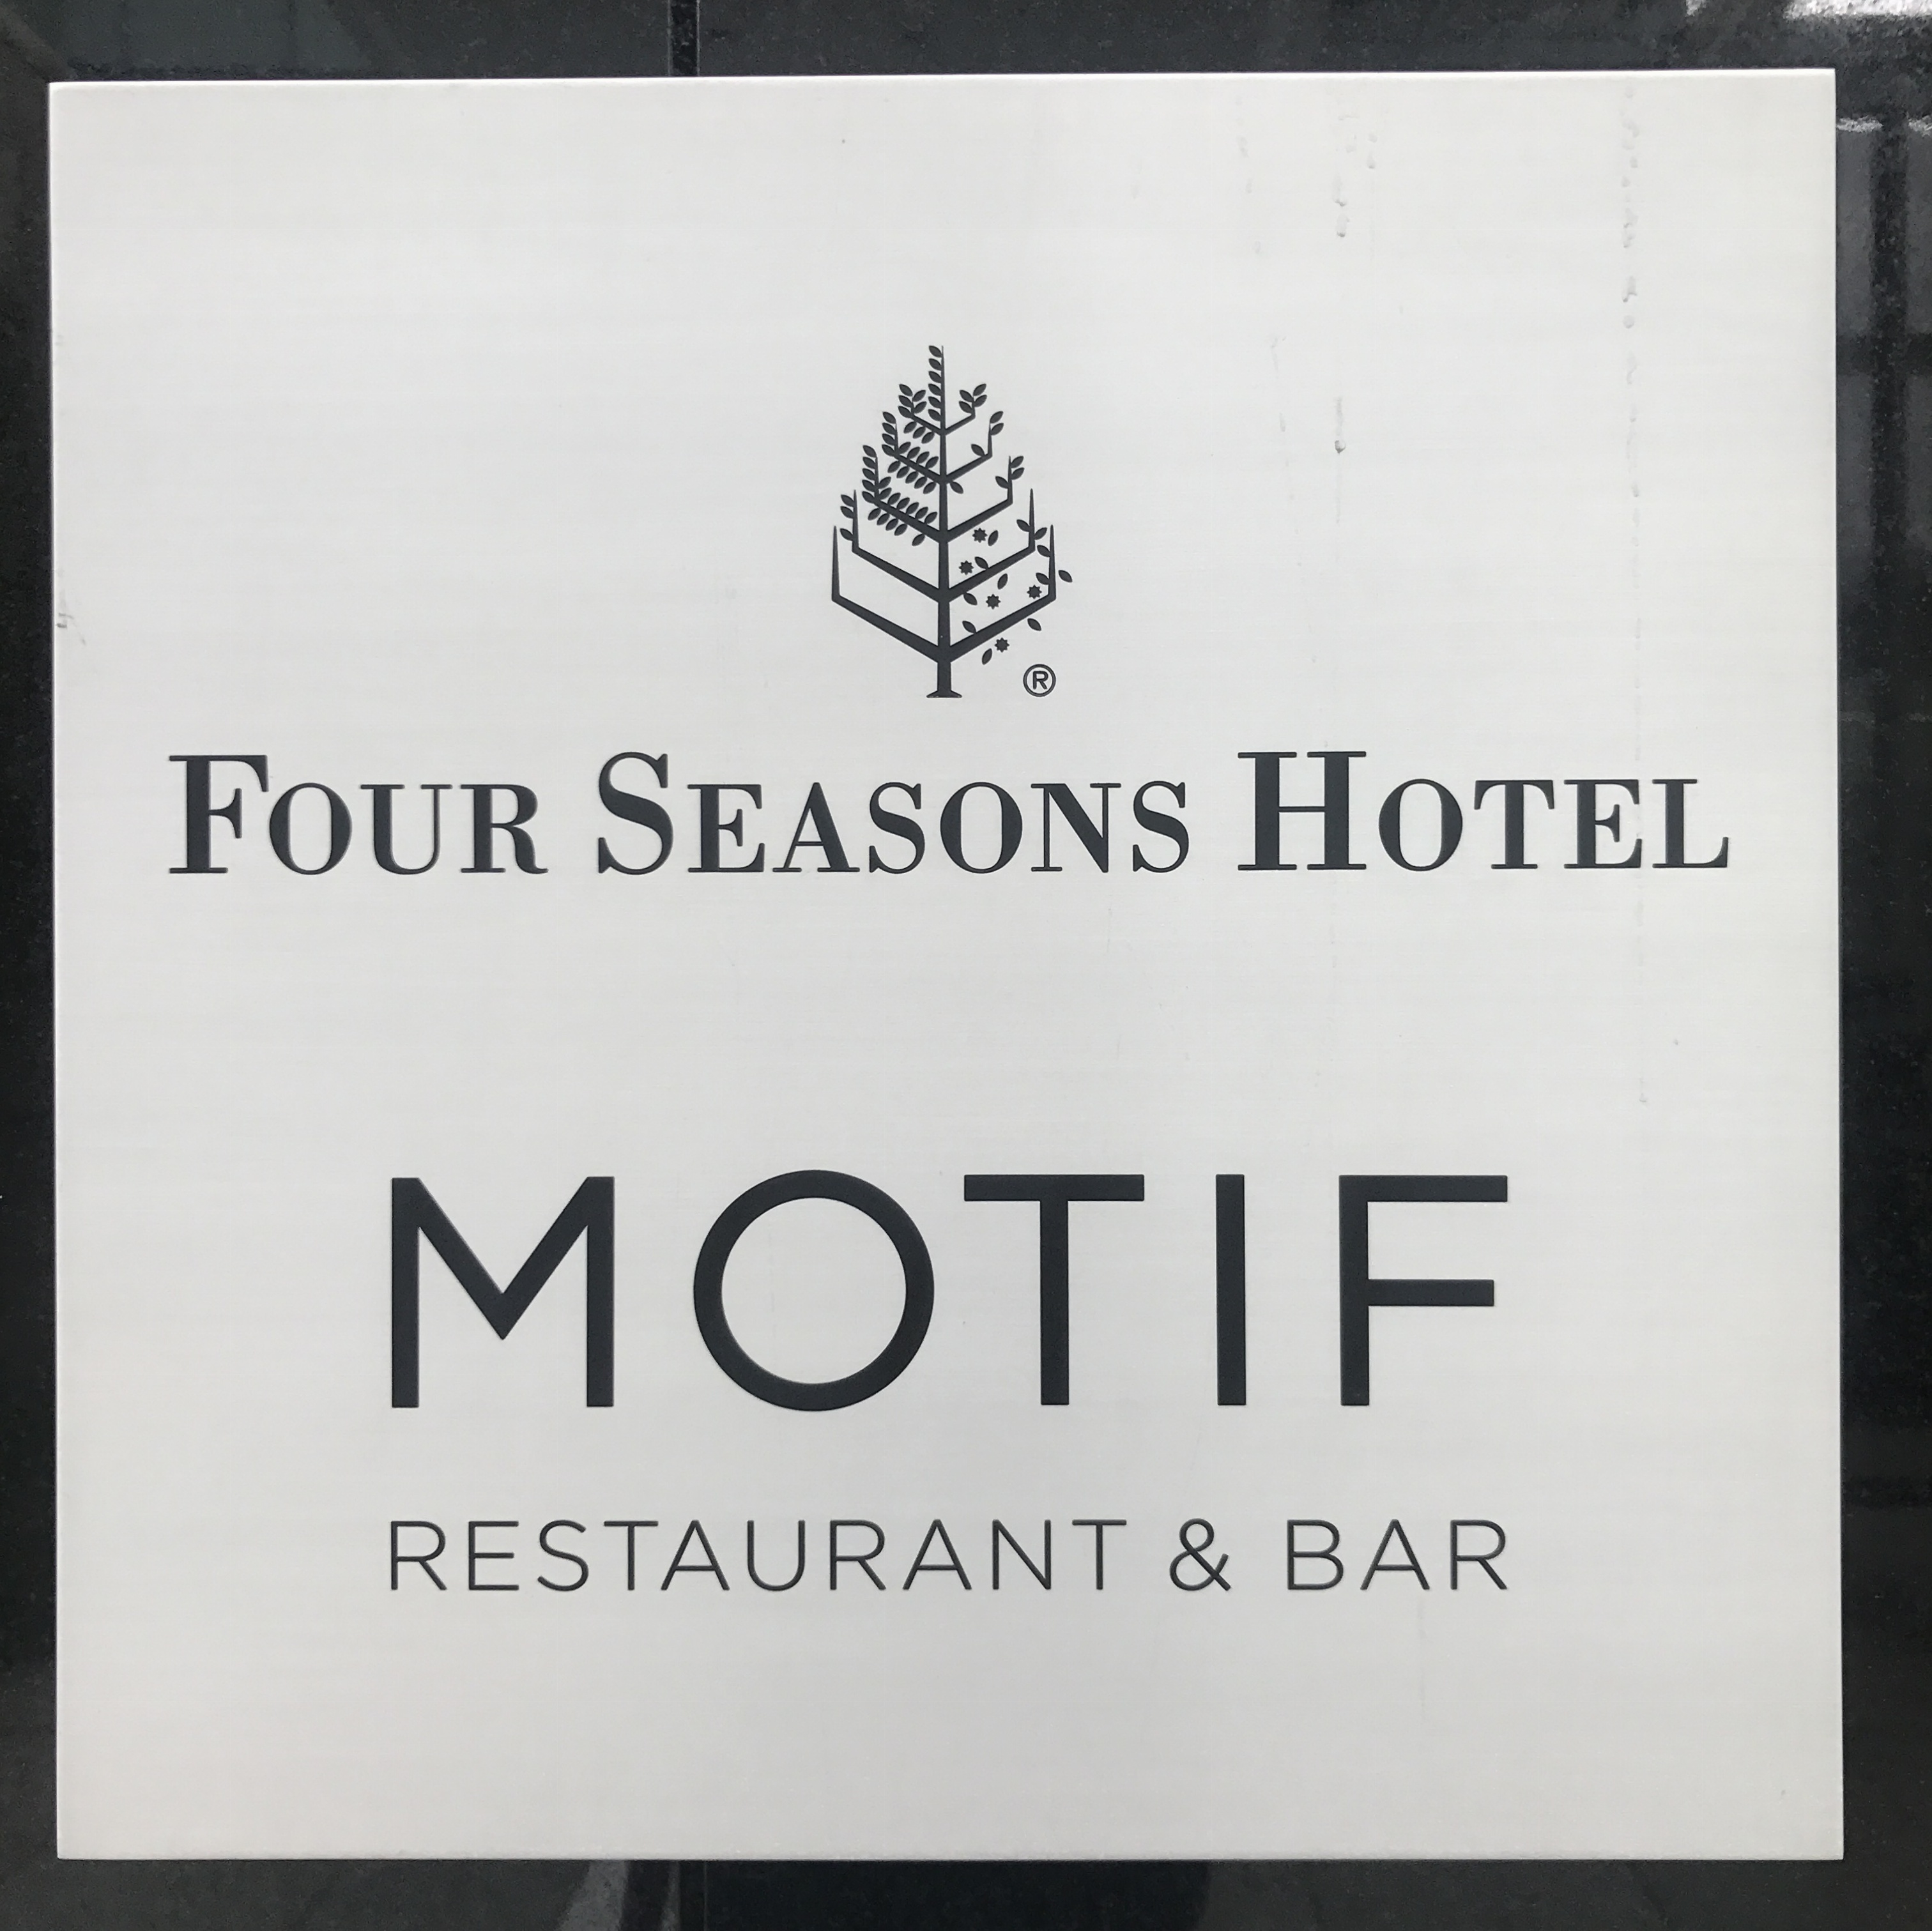 《MOTIF RESTAURANT & BAR @フォーシーズンズホテル丸の内》の贅沢ランチ&デザートビュッフェ♡_1